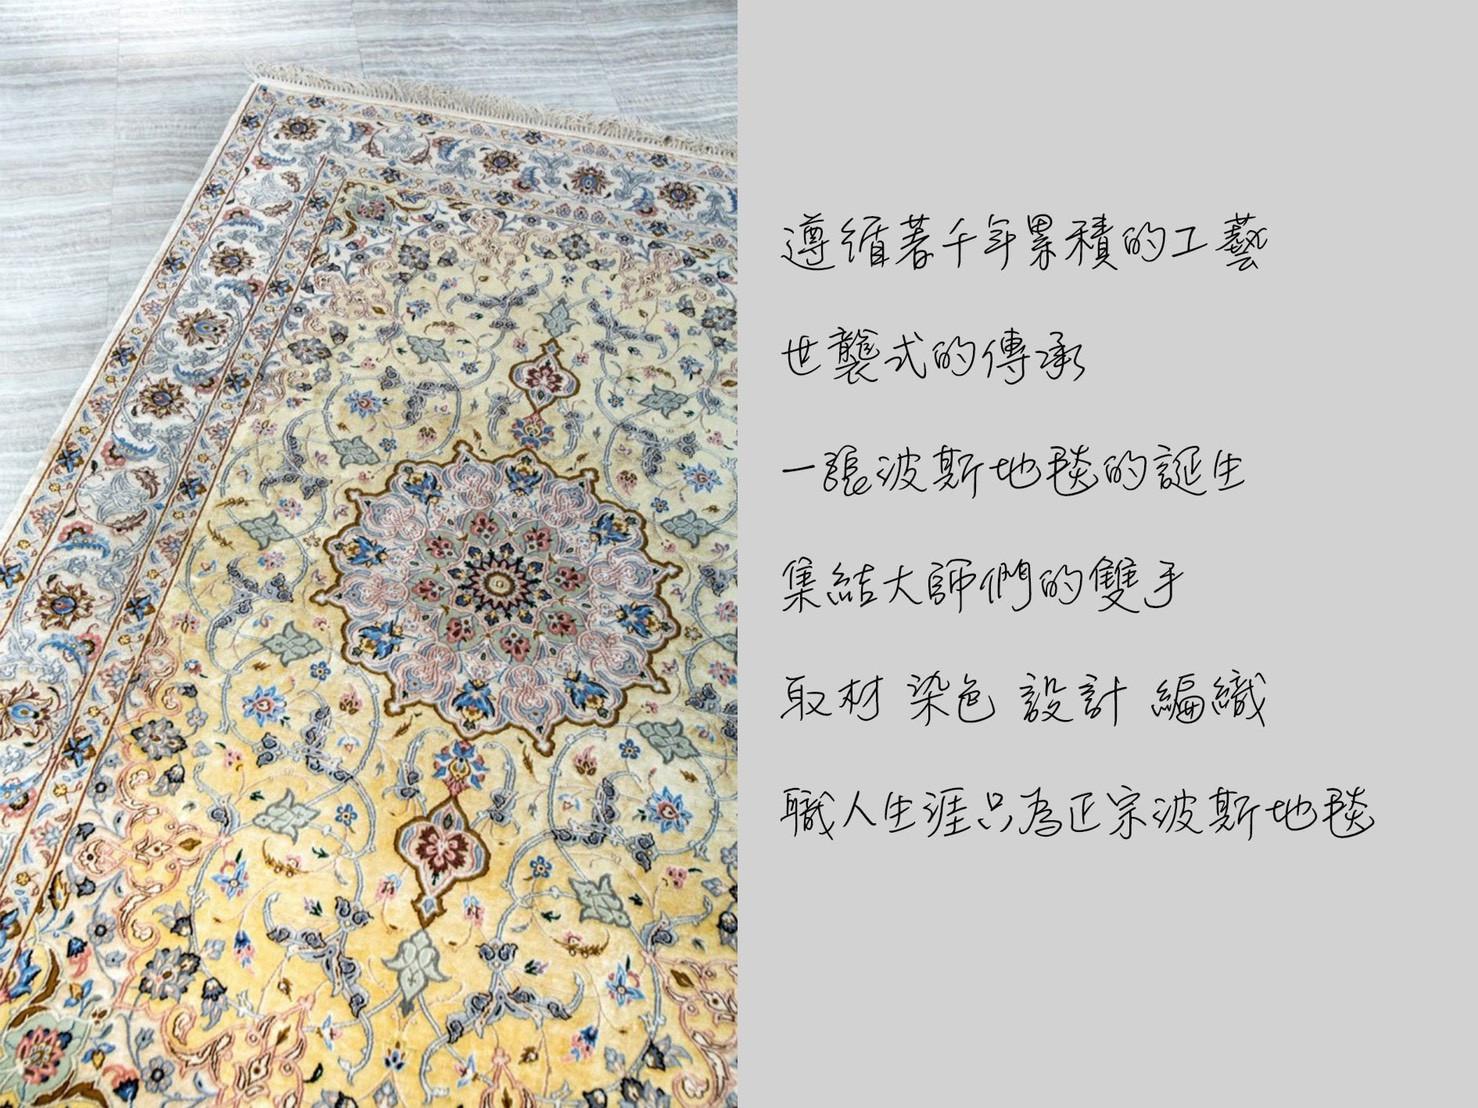 S__4055076.jpg